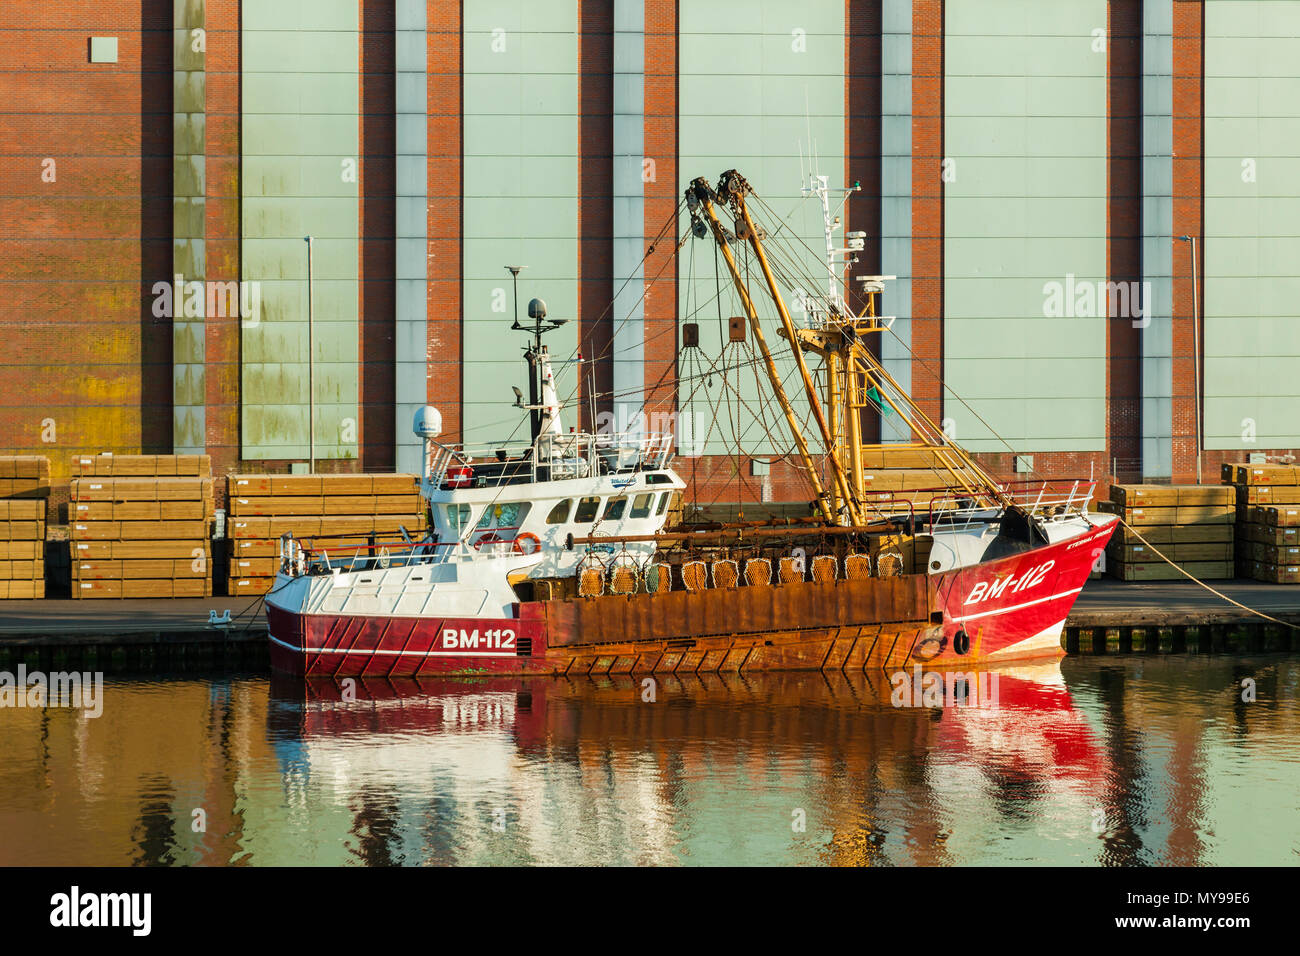 Rusty ship at Shoreham Port, West Sussex, England. Stock Photo